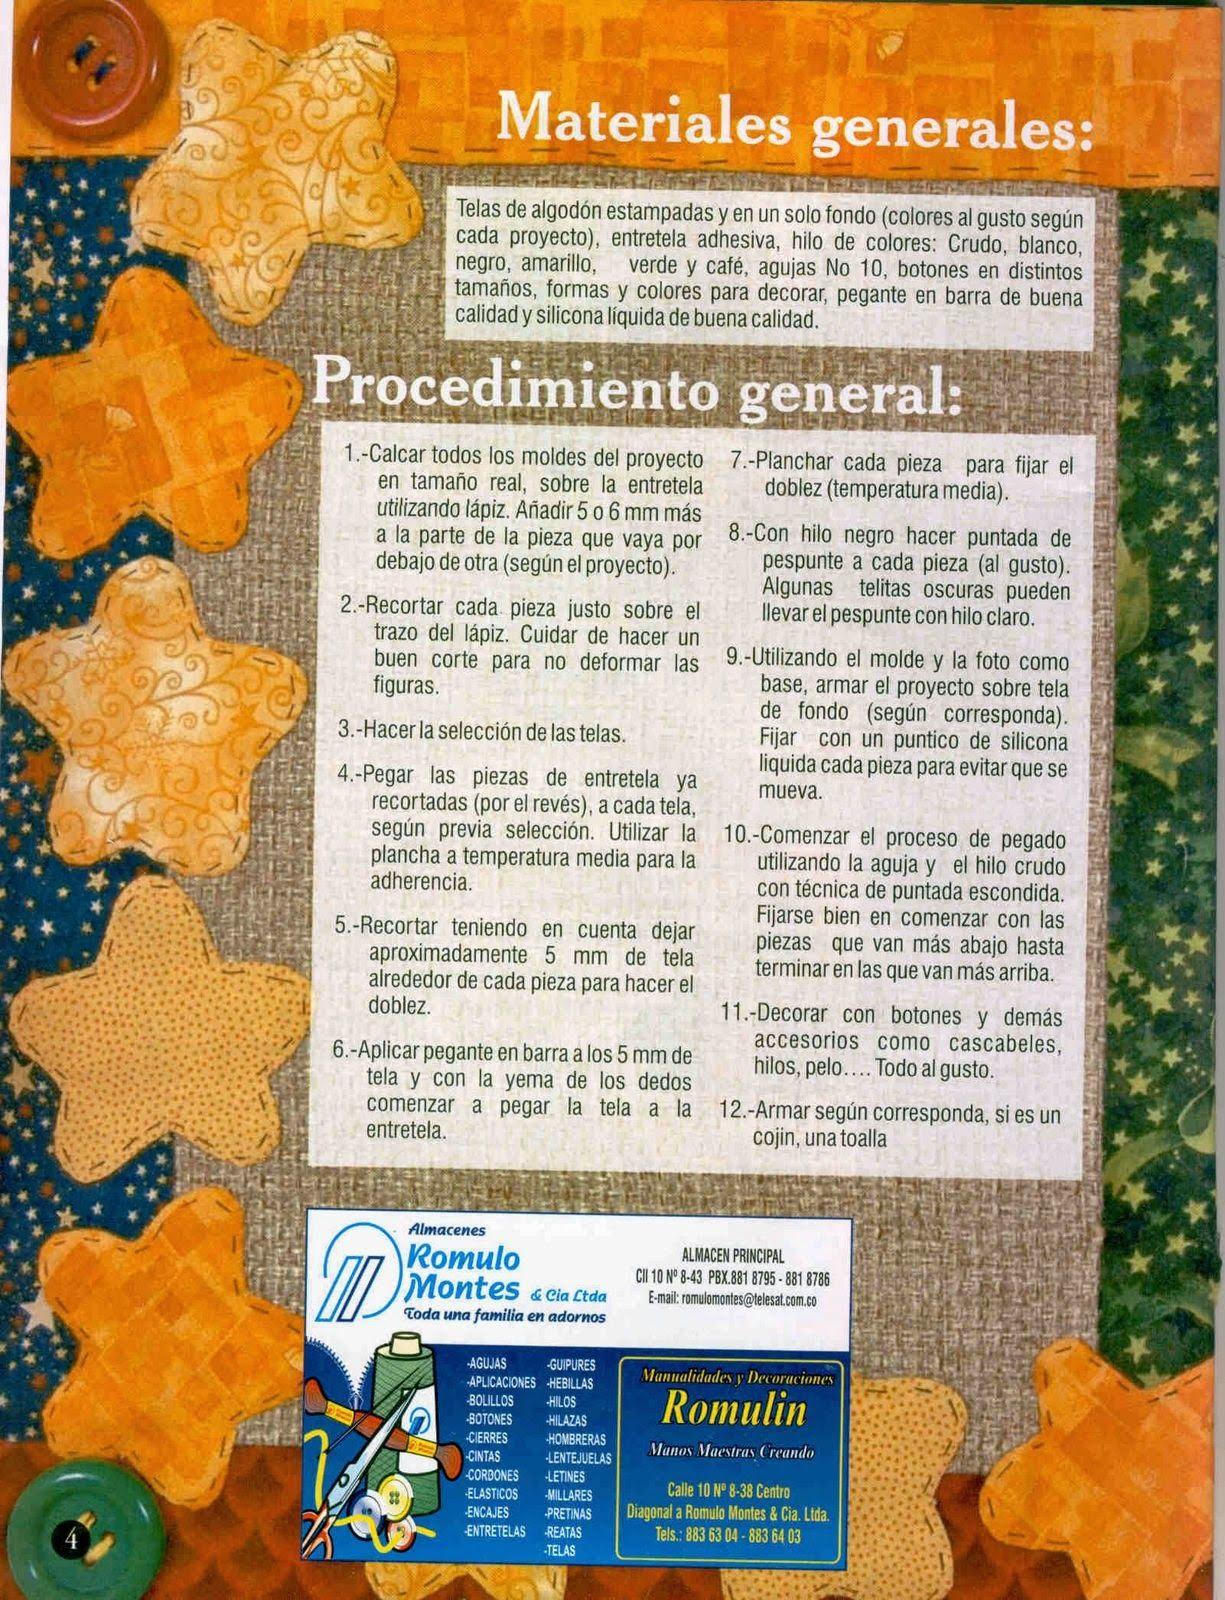 Revista De Patchwork Navideño Blog De Santa Clauss Revistas De Manualidades Manualidades Manualidades Navideñas